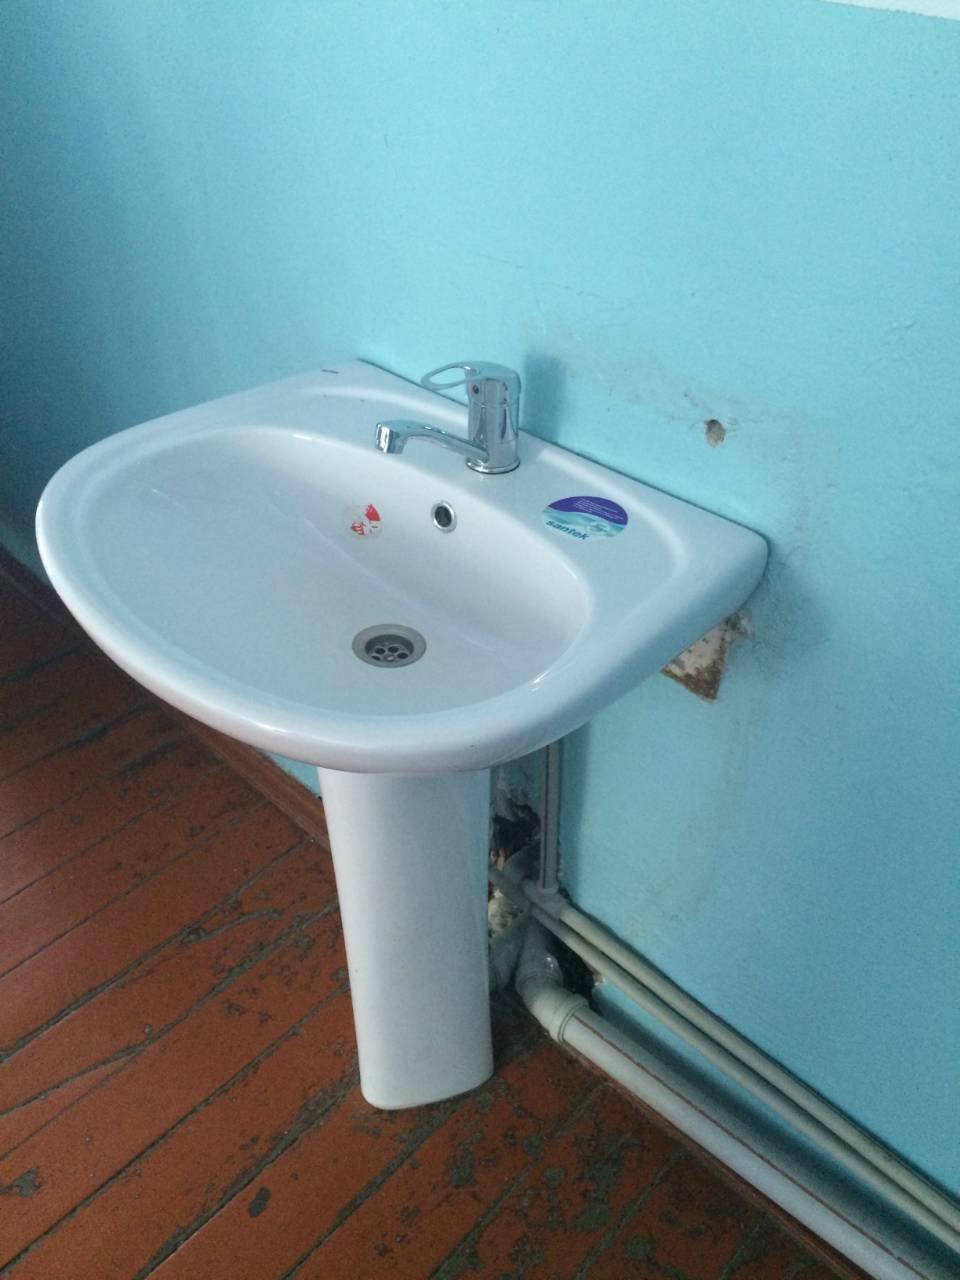 Conclusion of Bazar-Korgon Rehabilitation Center Bathroom Project - Kyrgyzstan